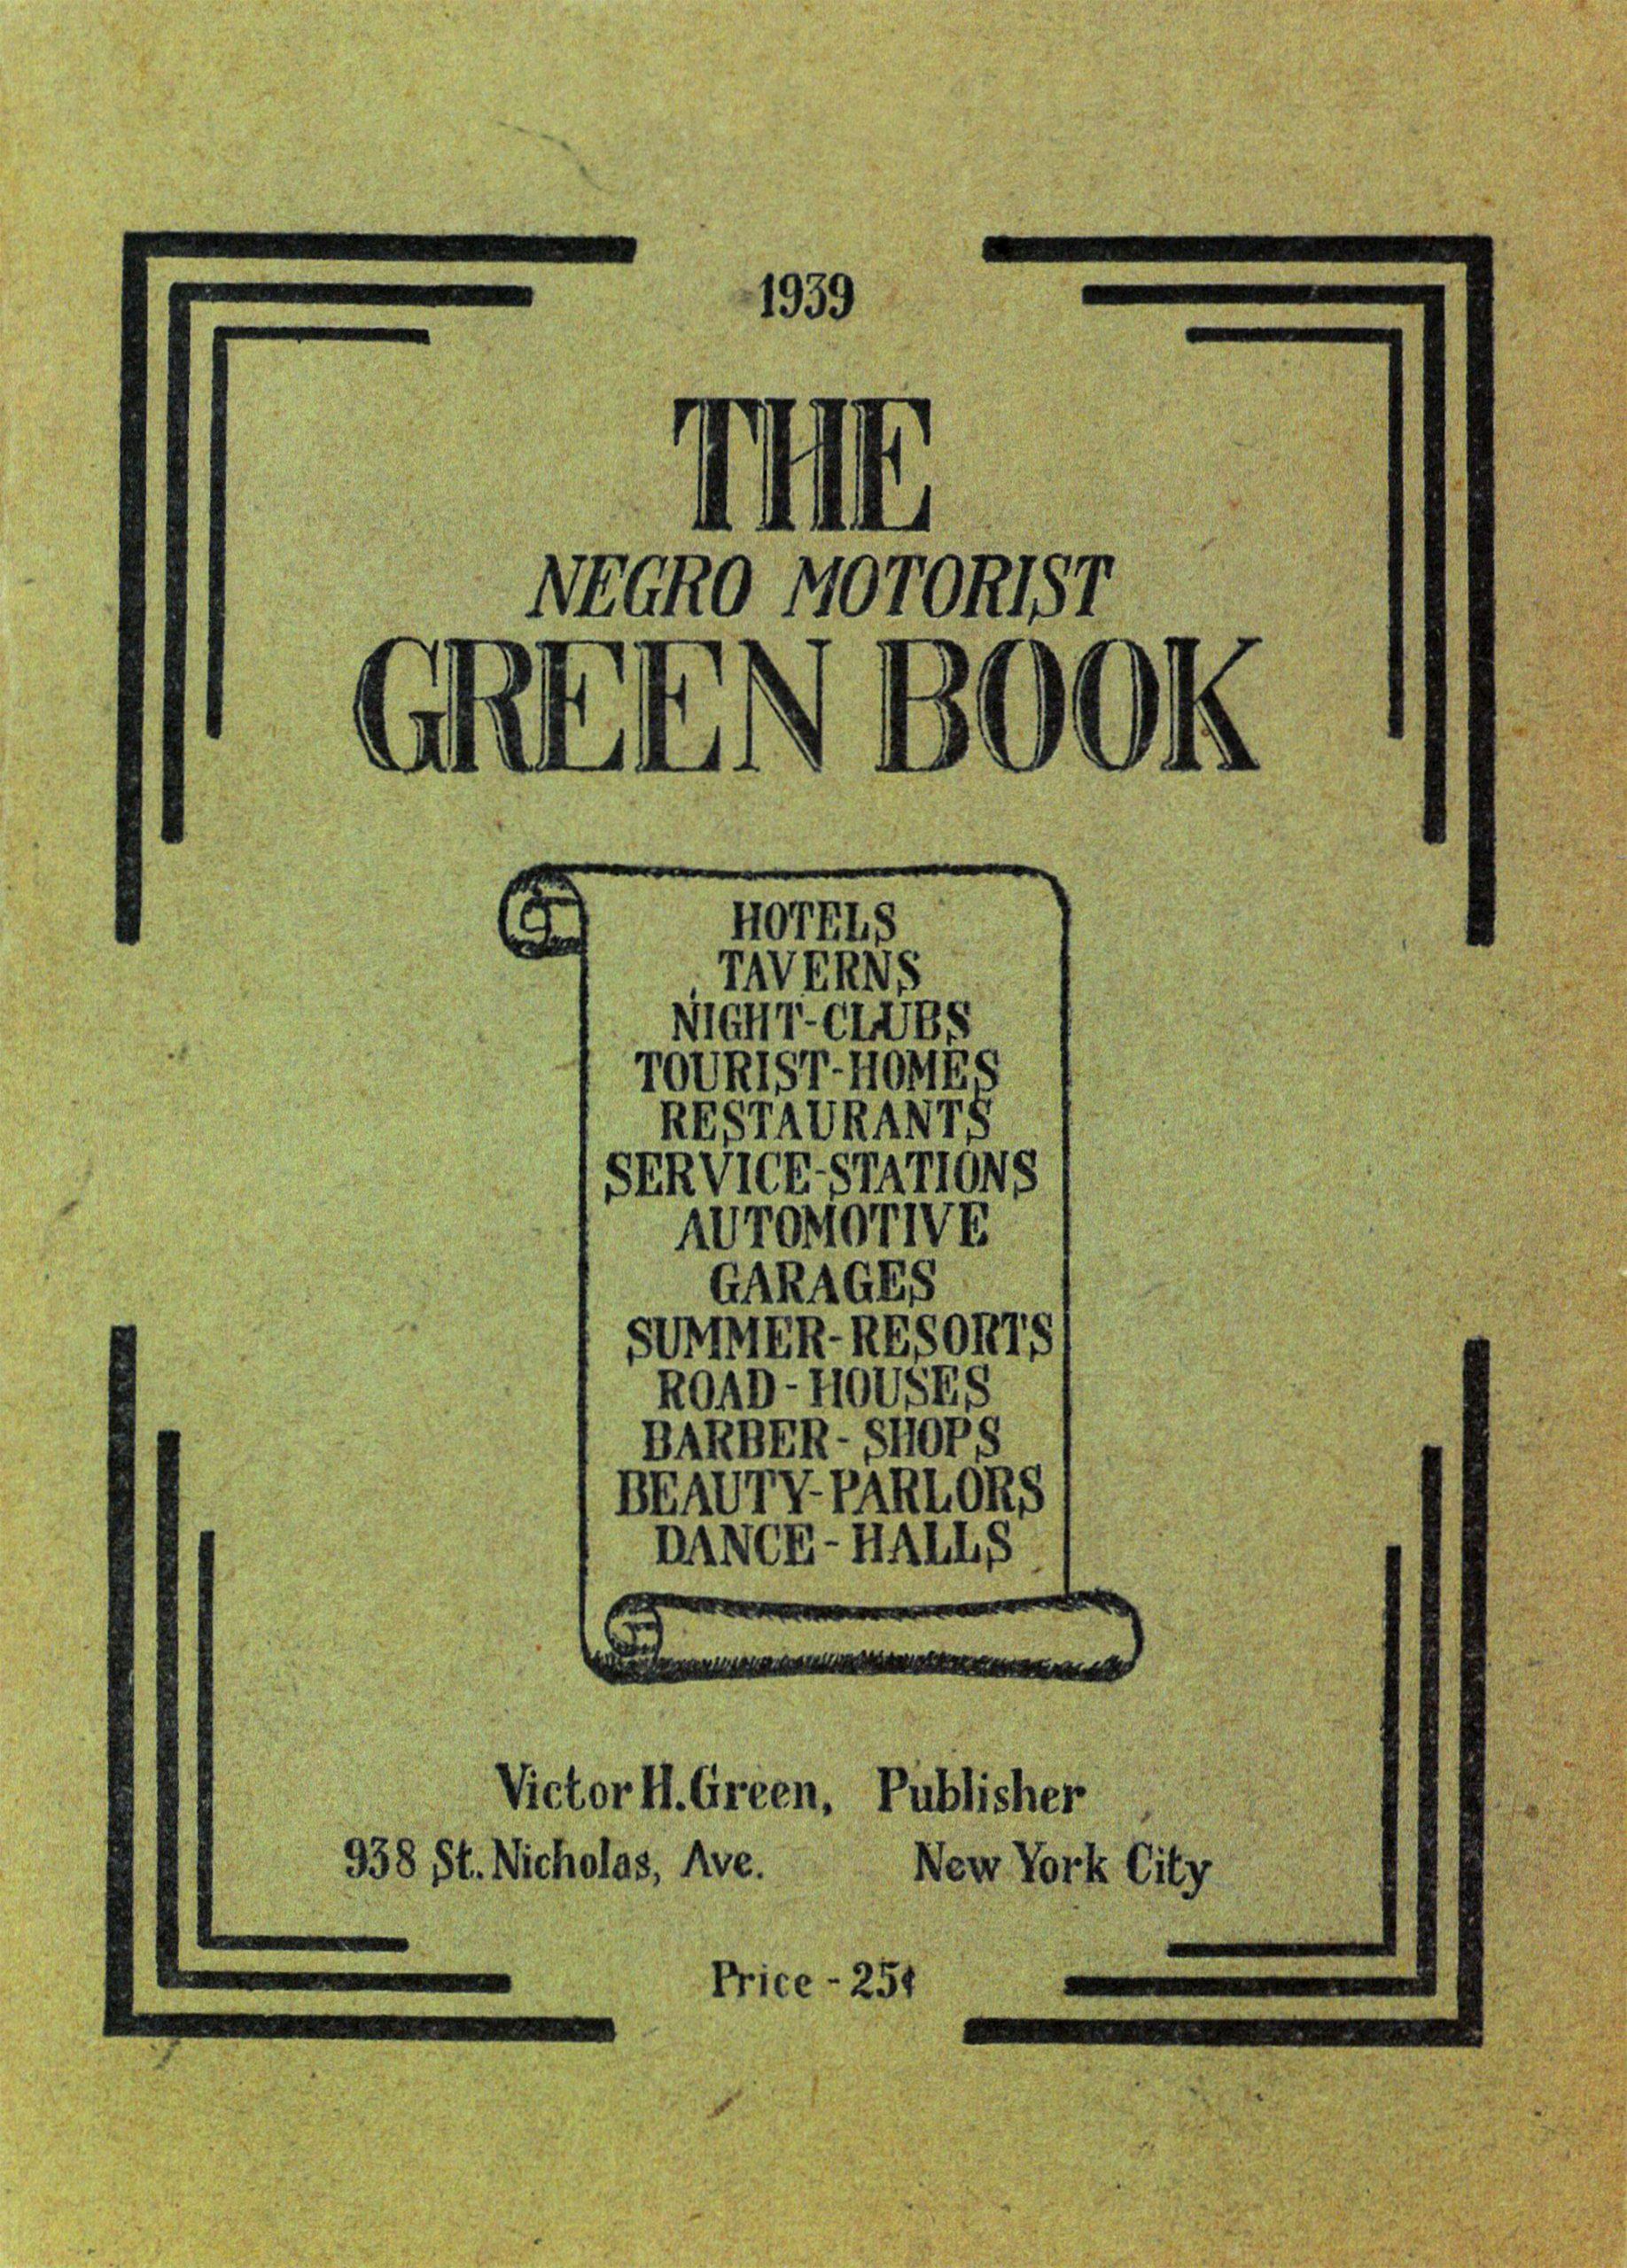 The Negro Motorist Green Book 1939 editon